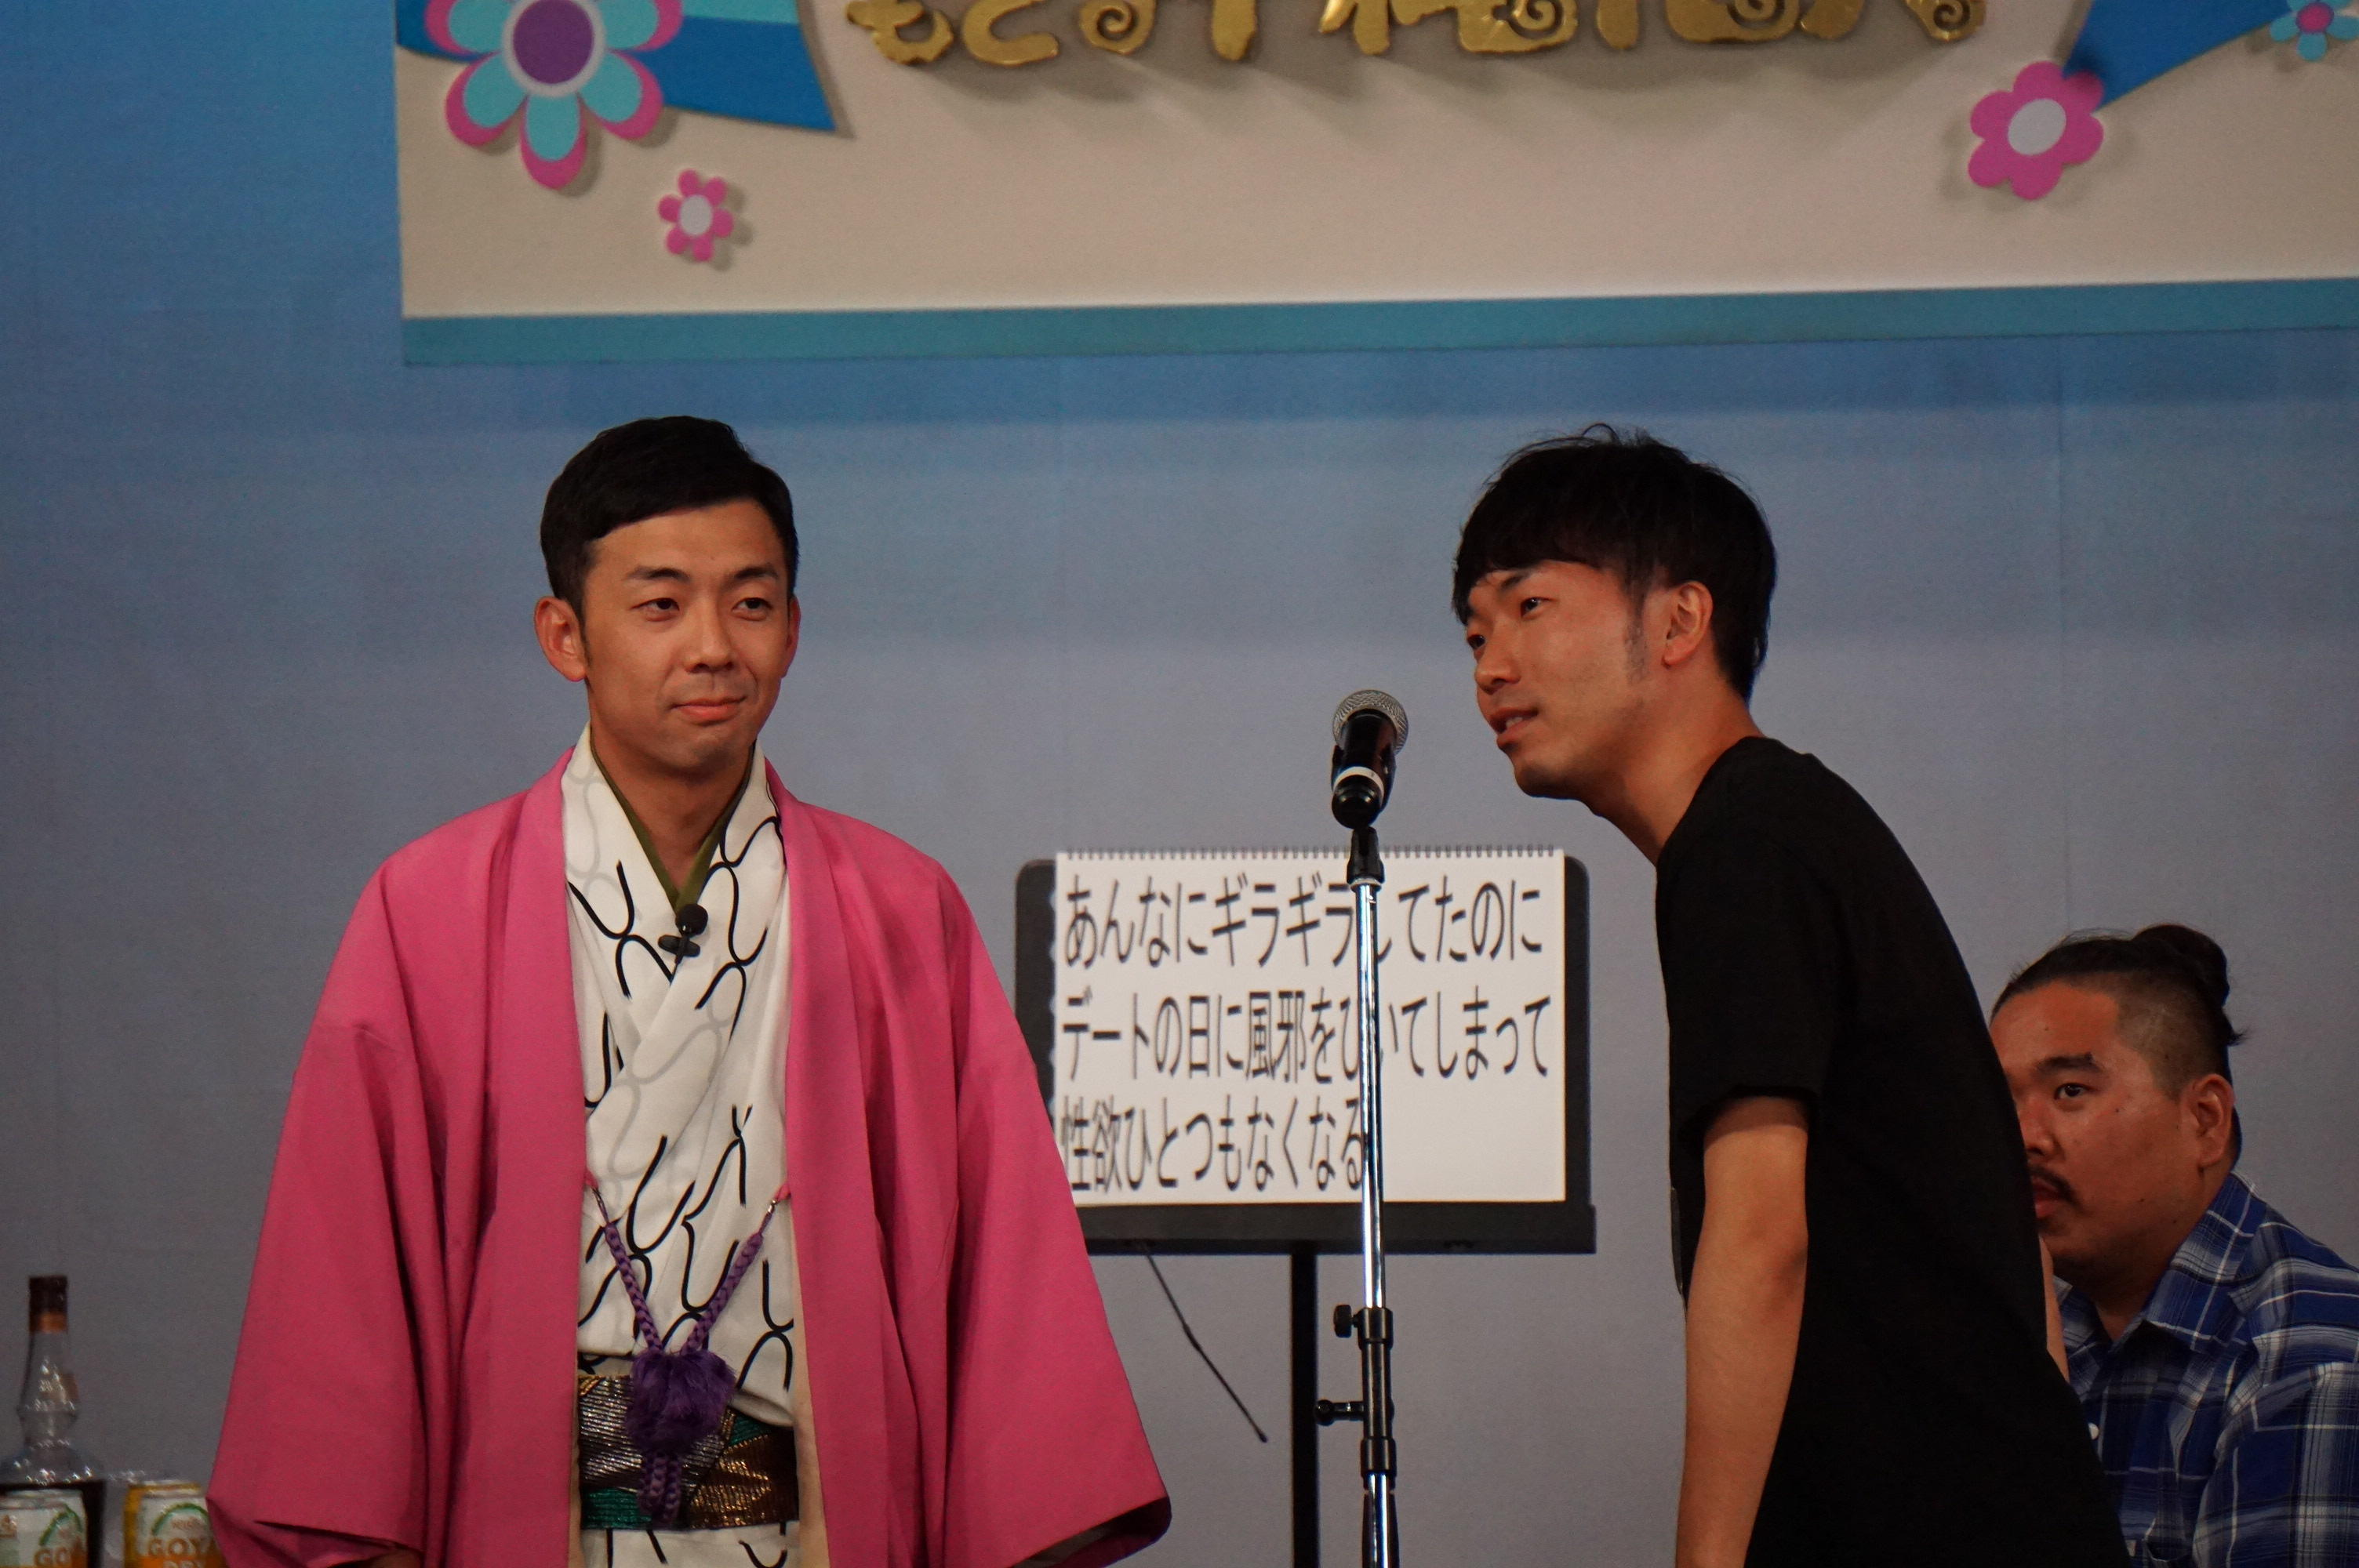 http://news.yoshimoto.co.jp/20161030180331-68a3d329586e32f97bc15028f5895ba19f810d24.jpg